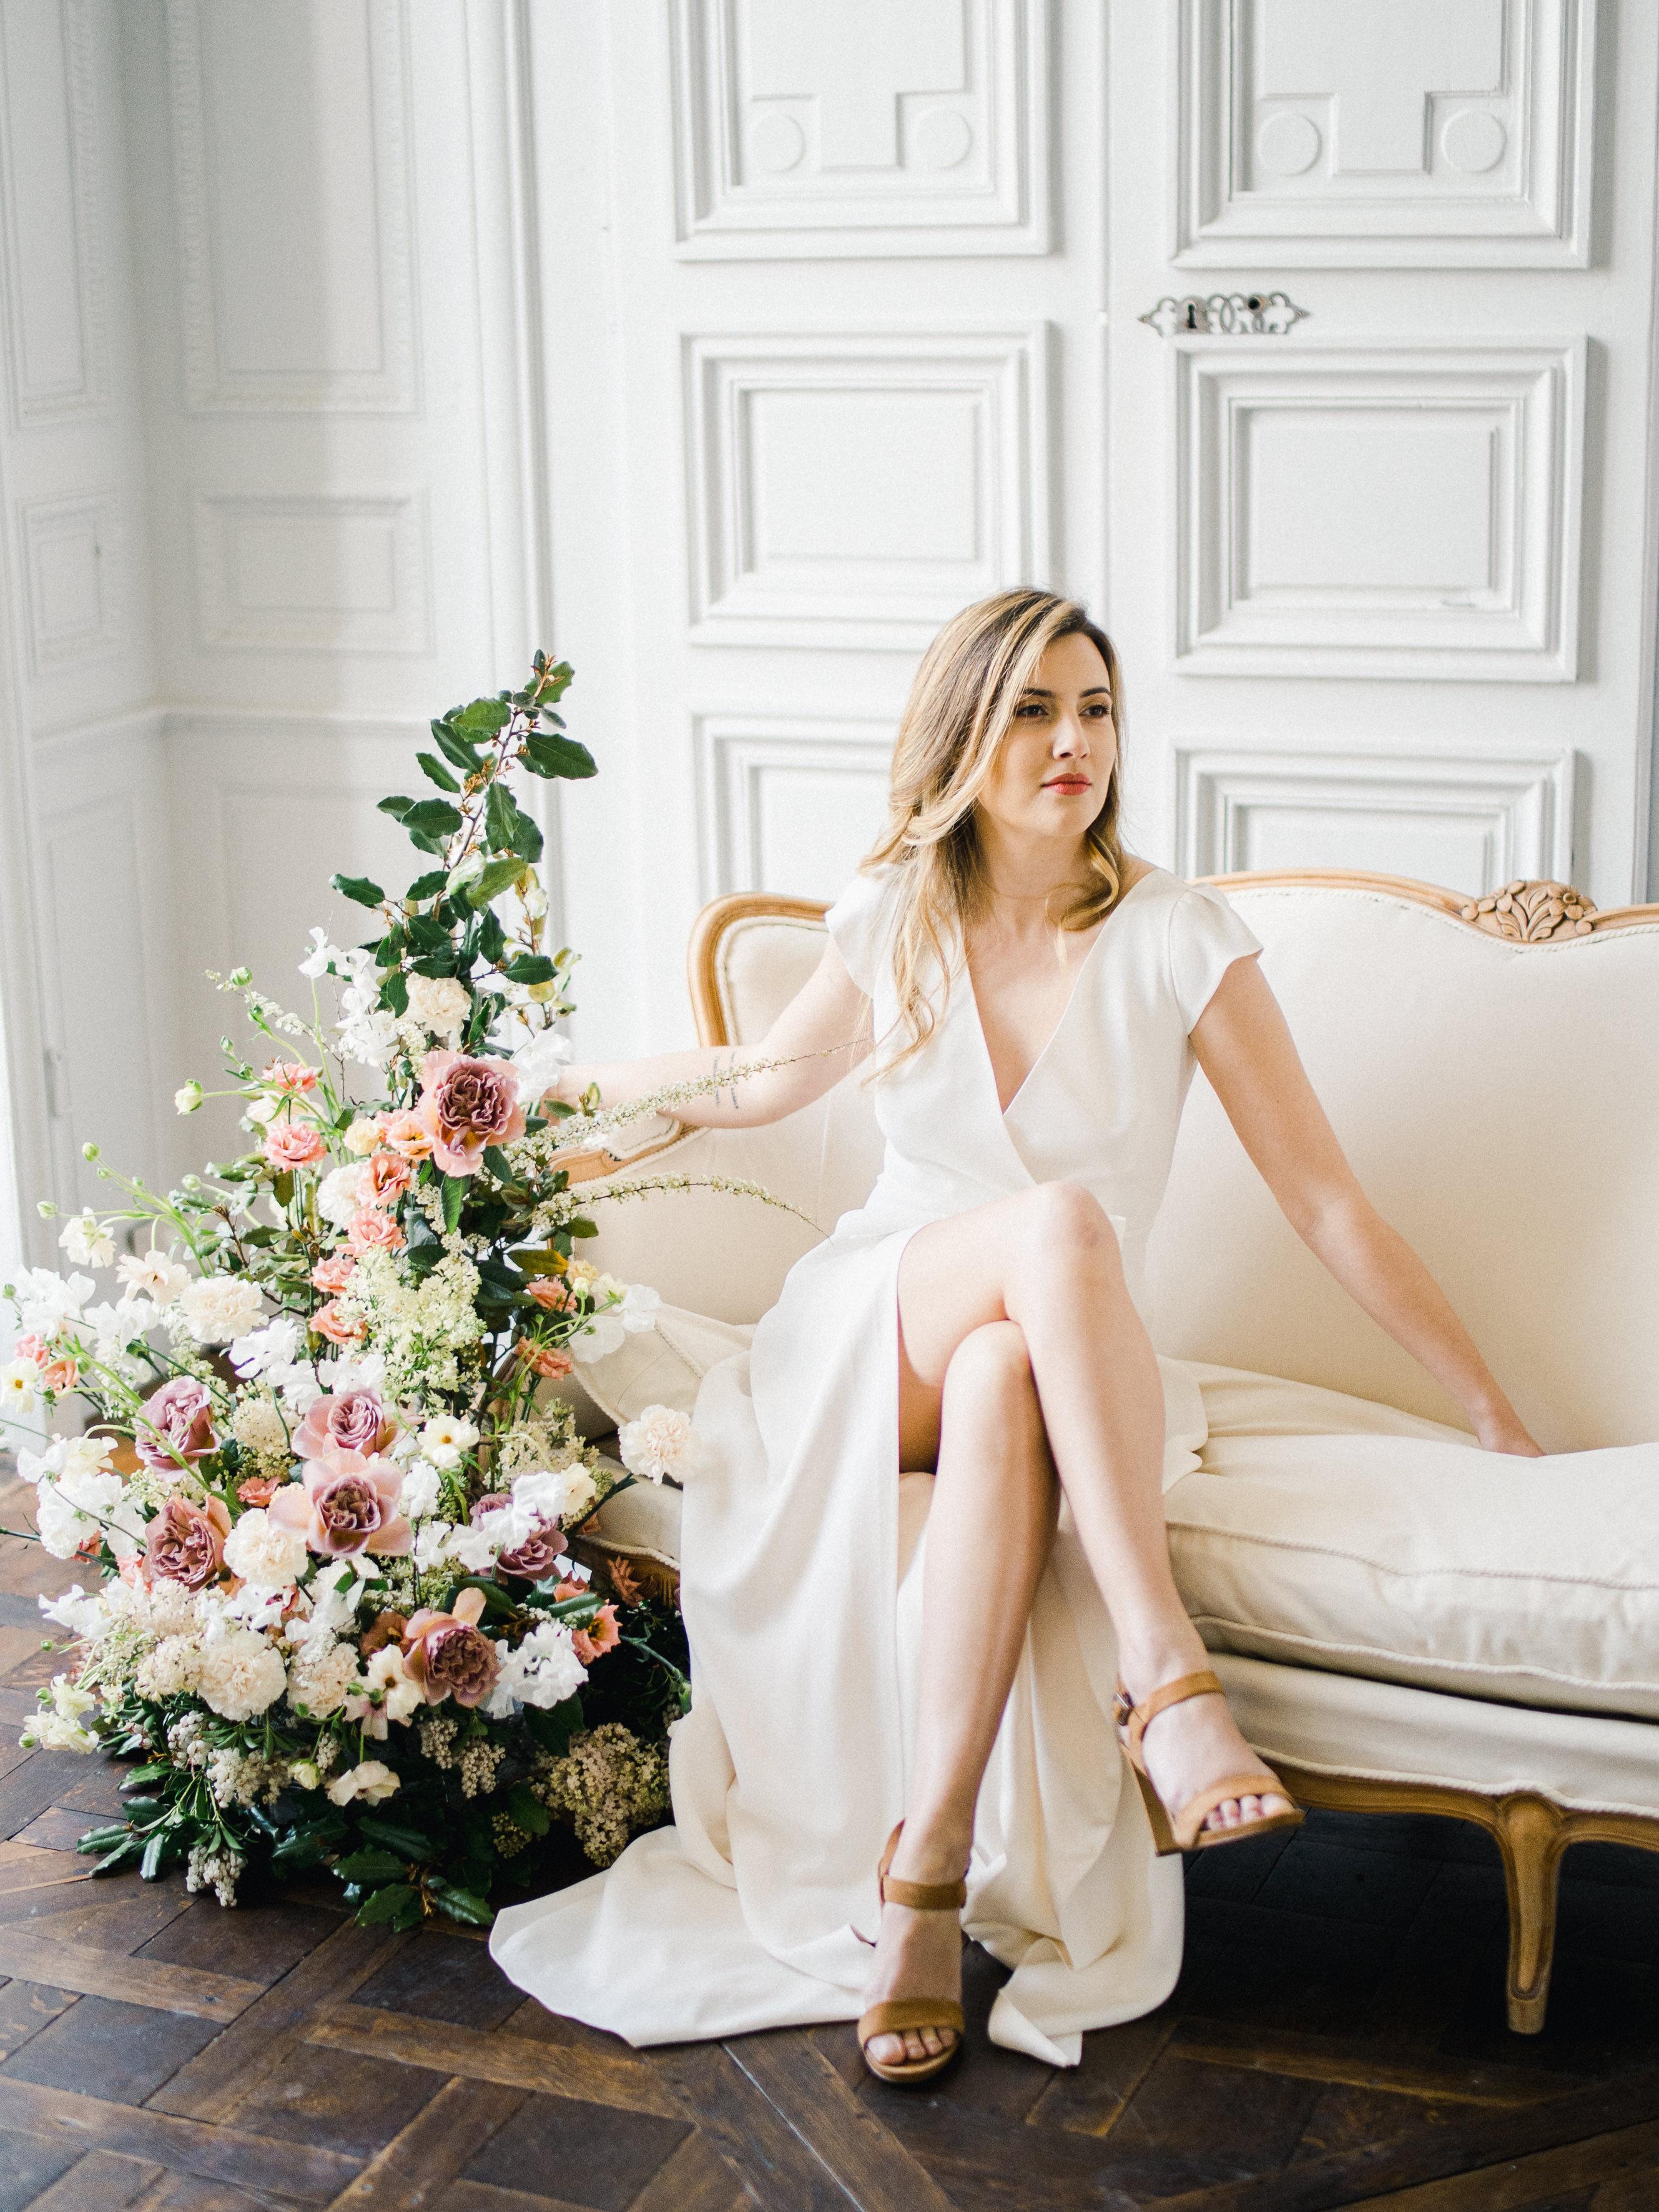 Elegant Whimsical French Chateau Wedding Inspiration Romain Vaucher 33